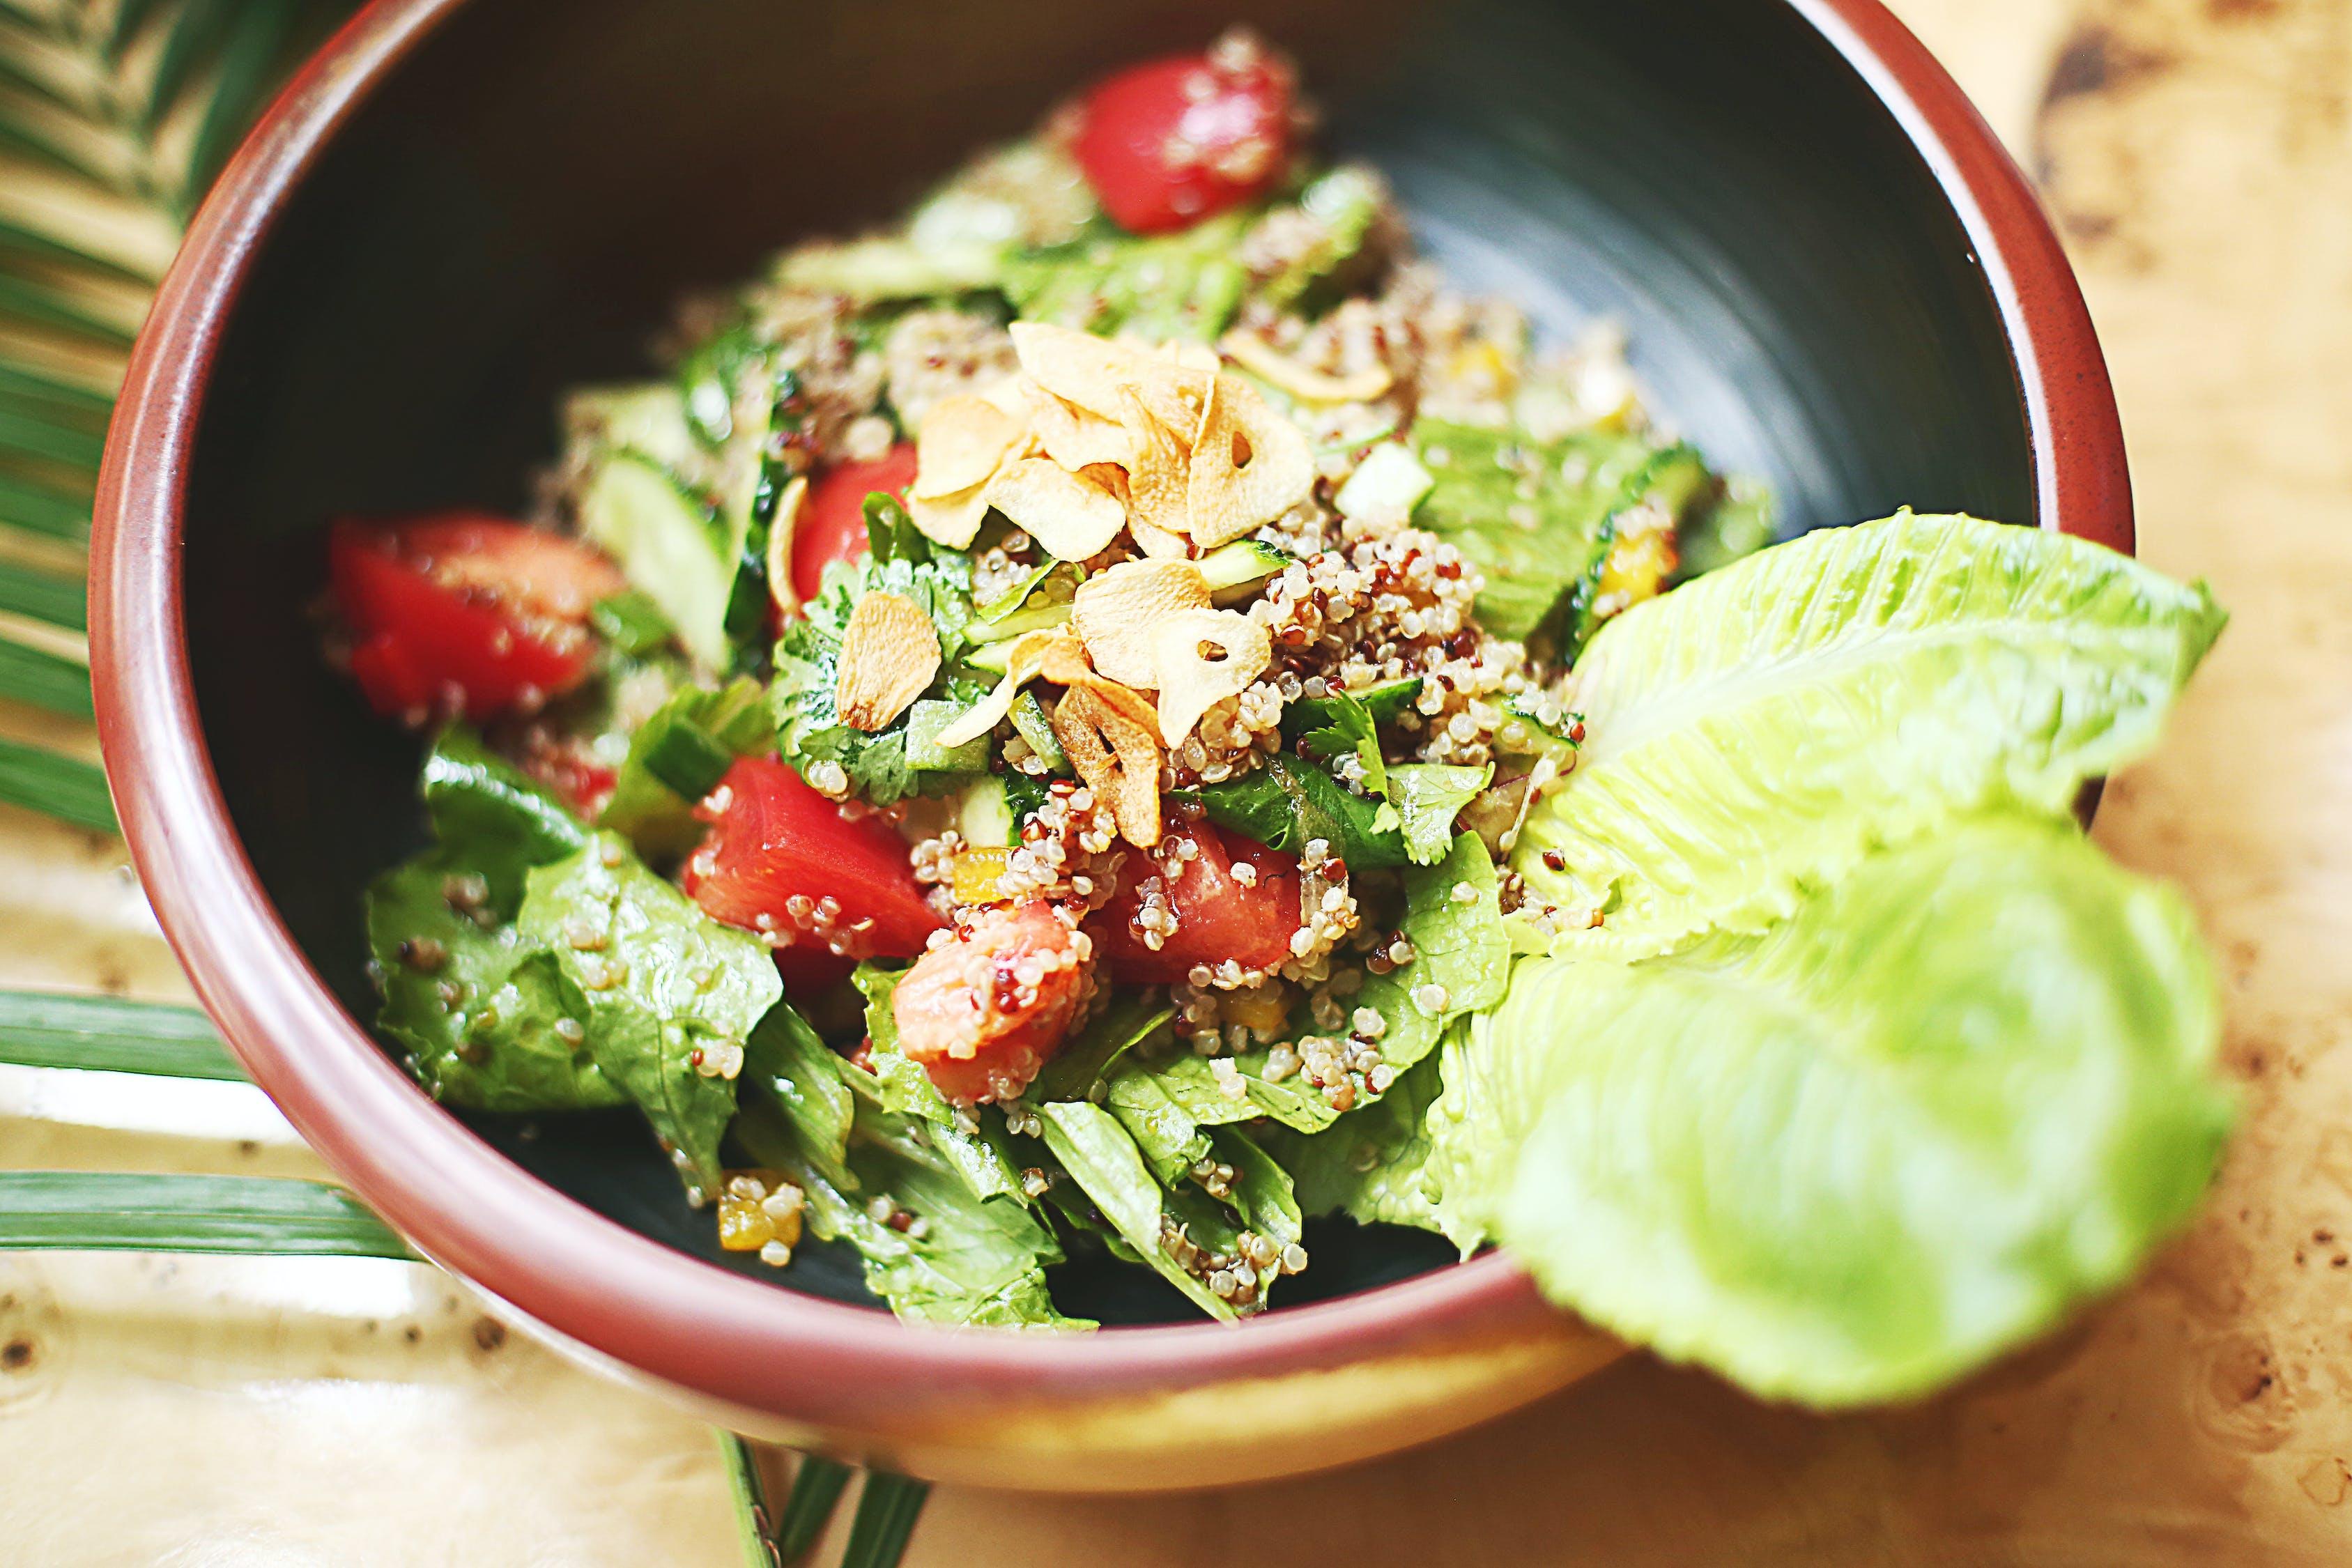 Vegetable Salad on Ceramic Bowl